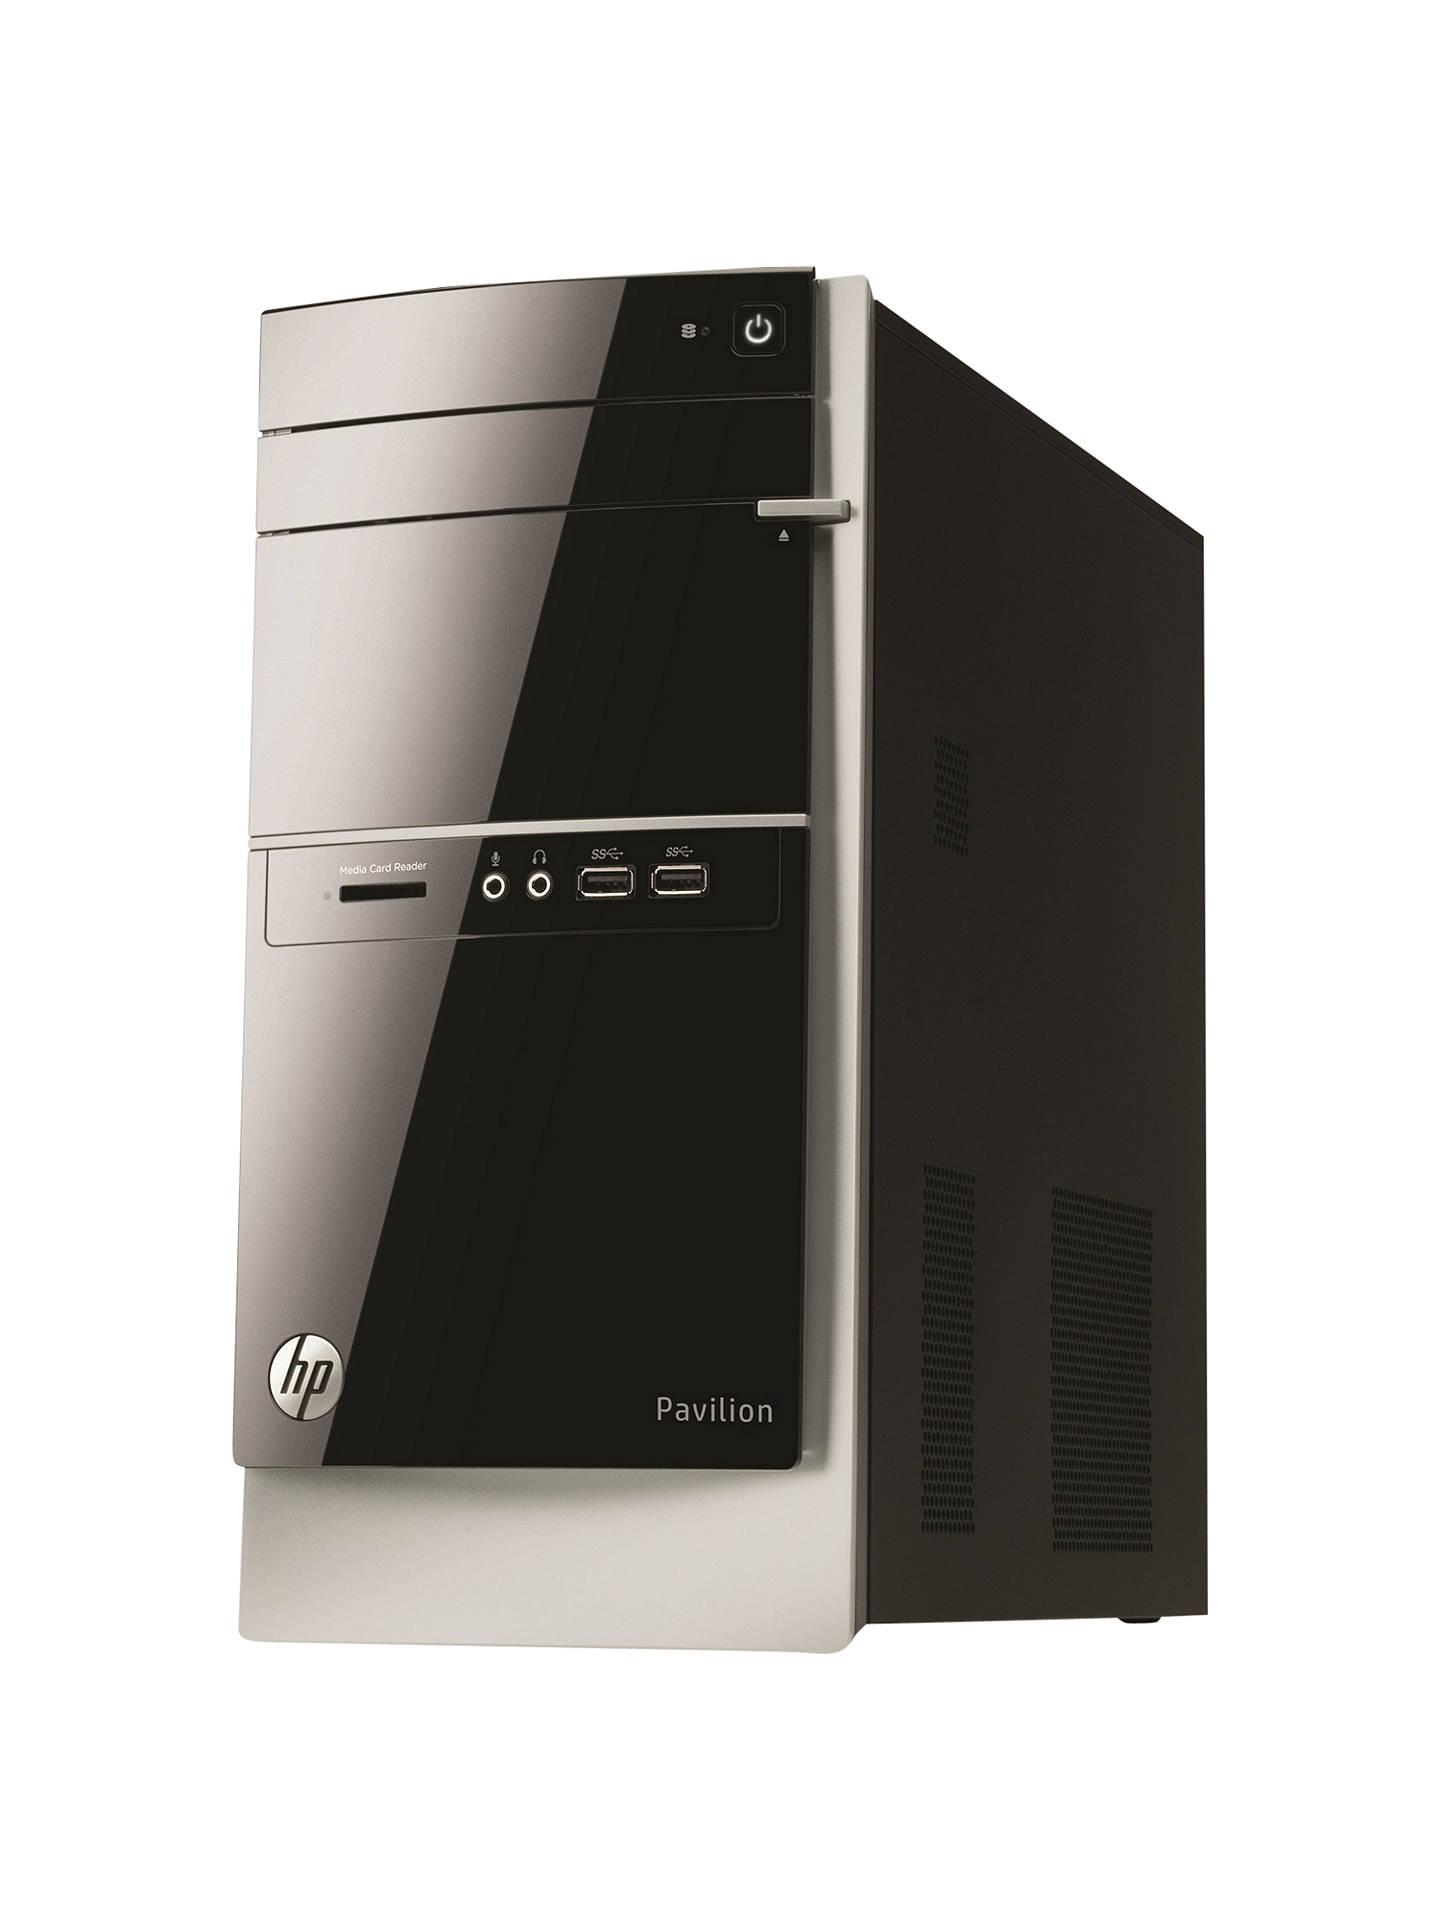 HP Pavilion 500-400na Desktop PC, AMD A10, 6GB RAM, 2TB, Black at